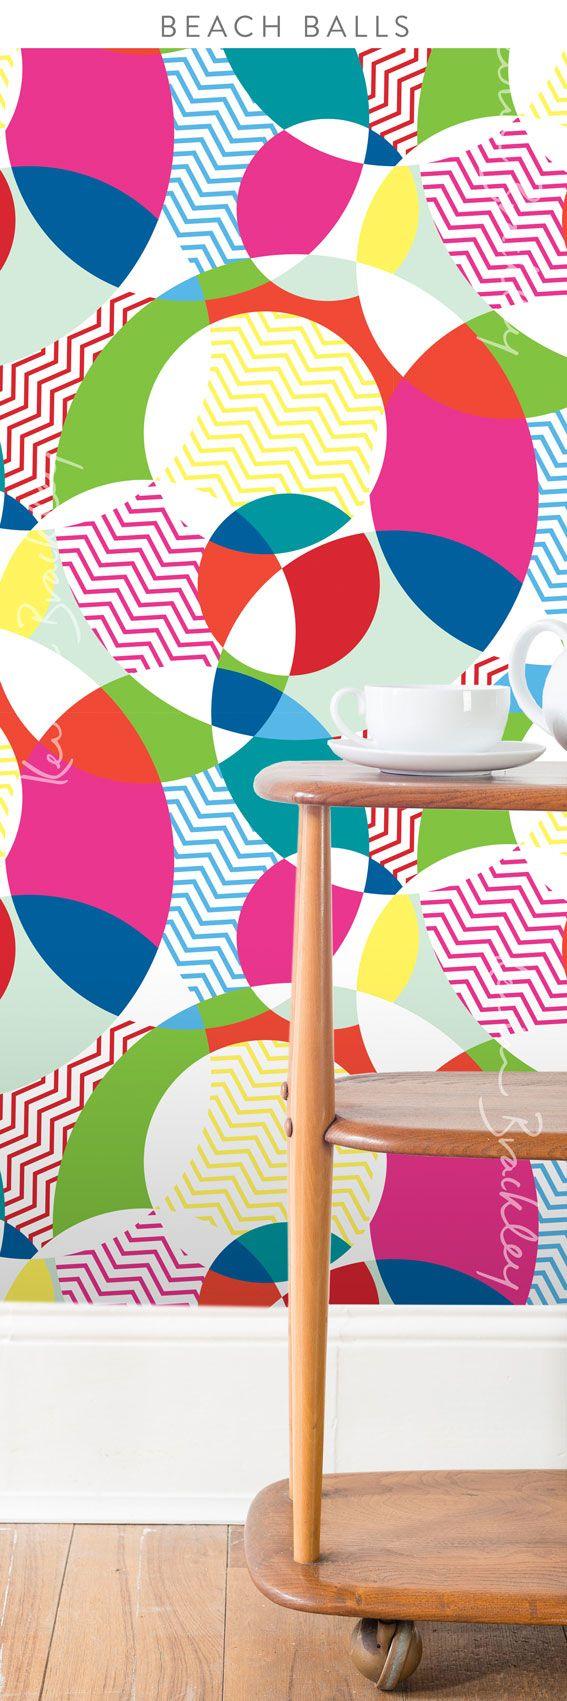 Wallpaper concept in my Beach Balls design